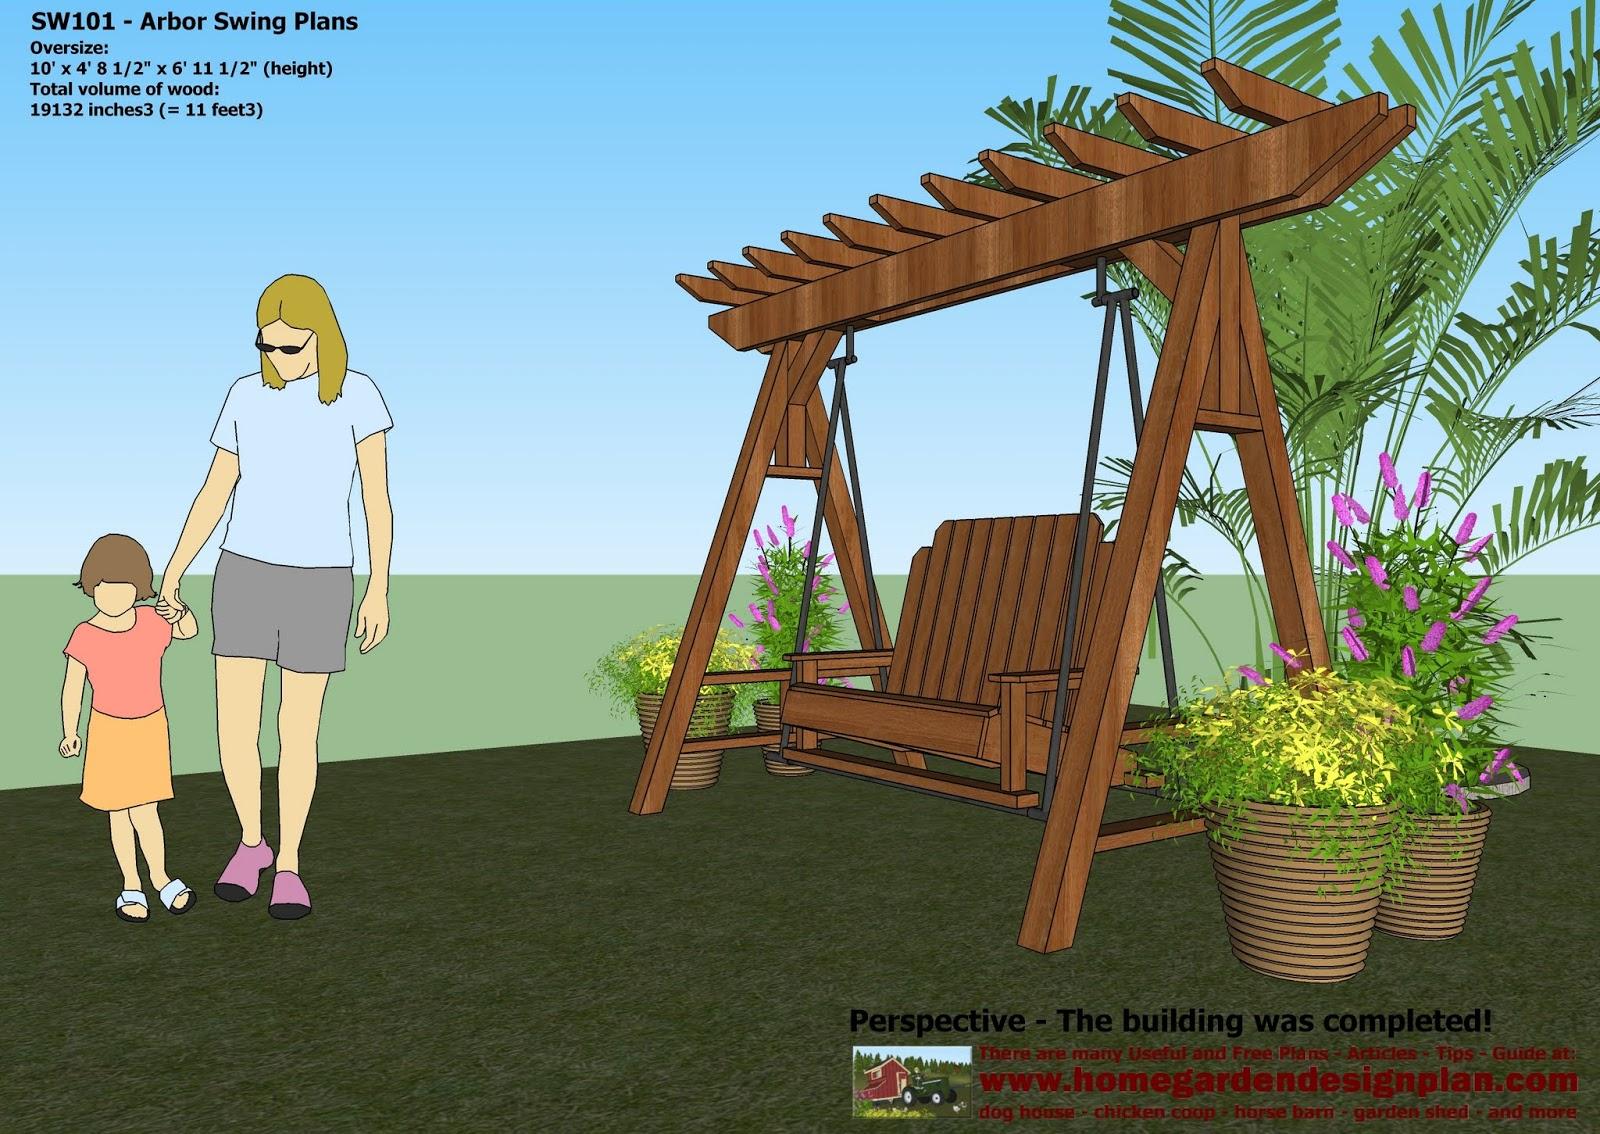 Home Garden Plans Sw101 Arbor Swing Plans Construction - garden swing designs